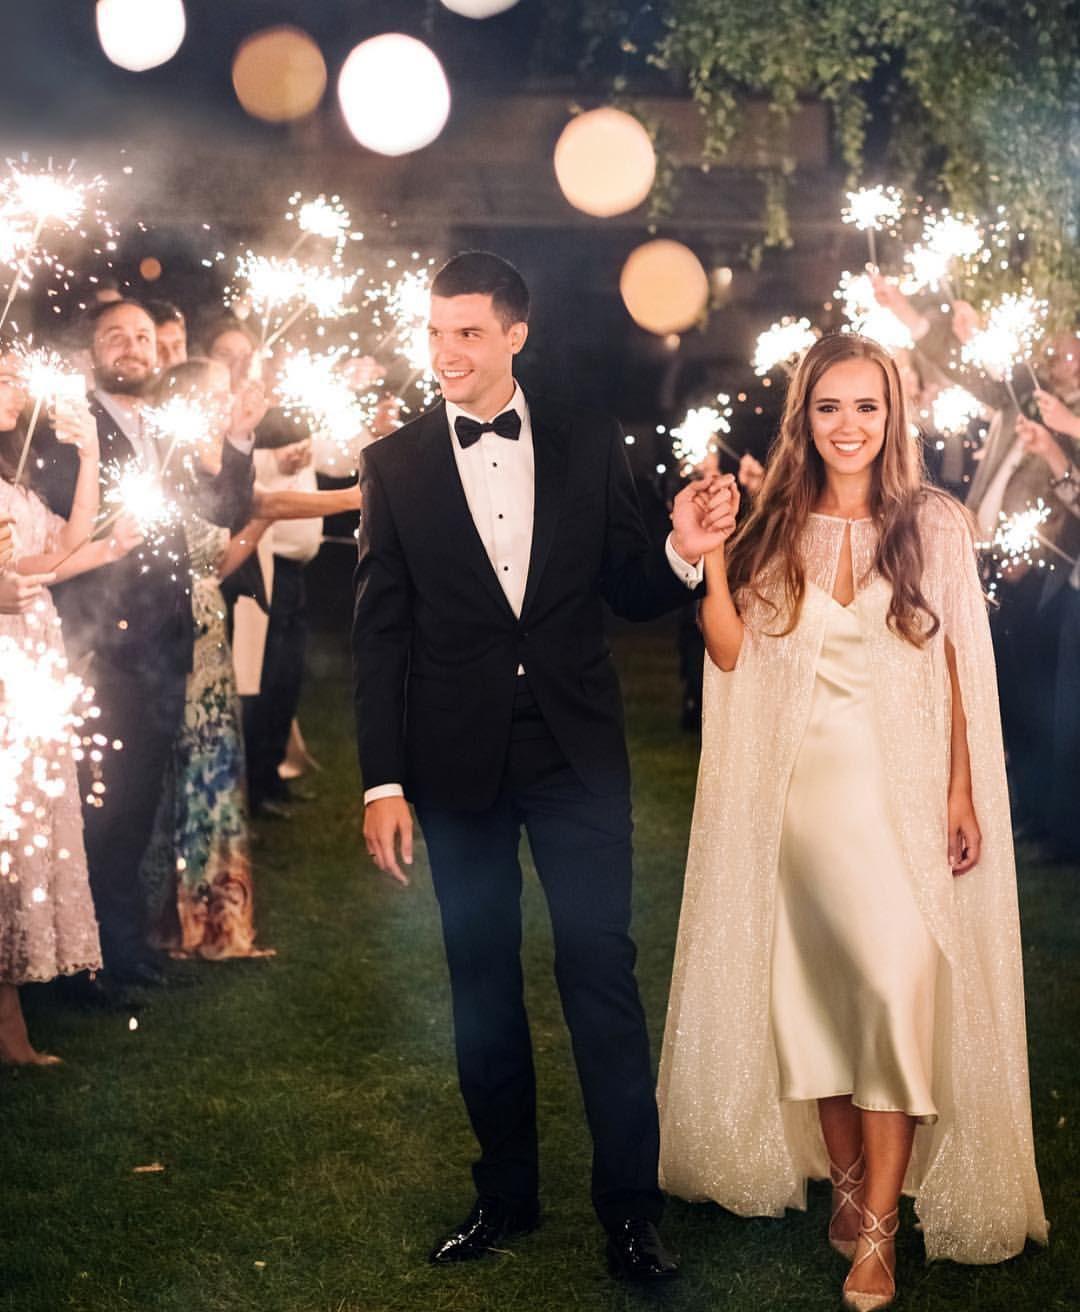 Wedding Altar Groomsmen: Pin By Amanda Blue On Wedding Inspiration